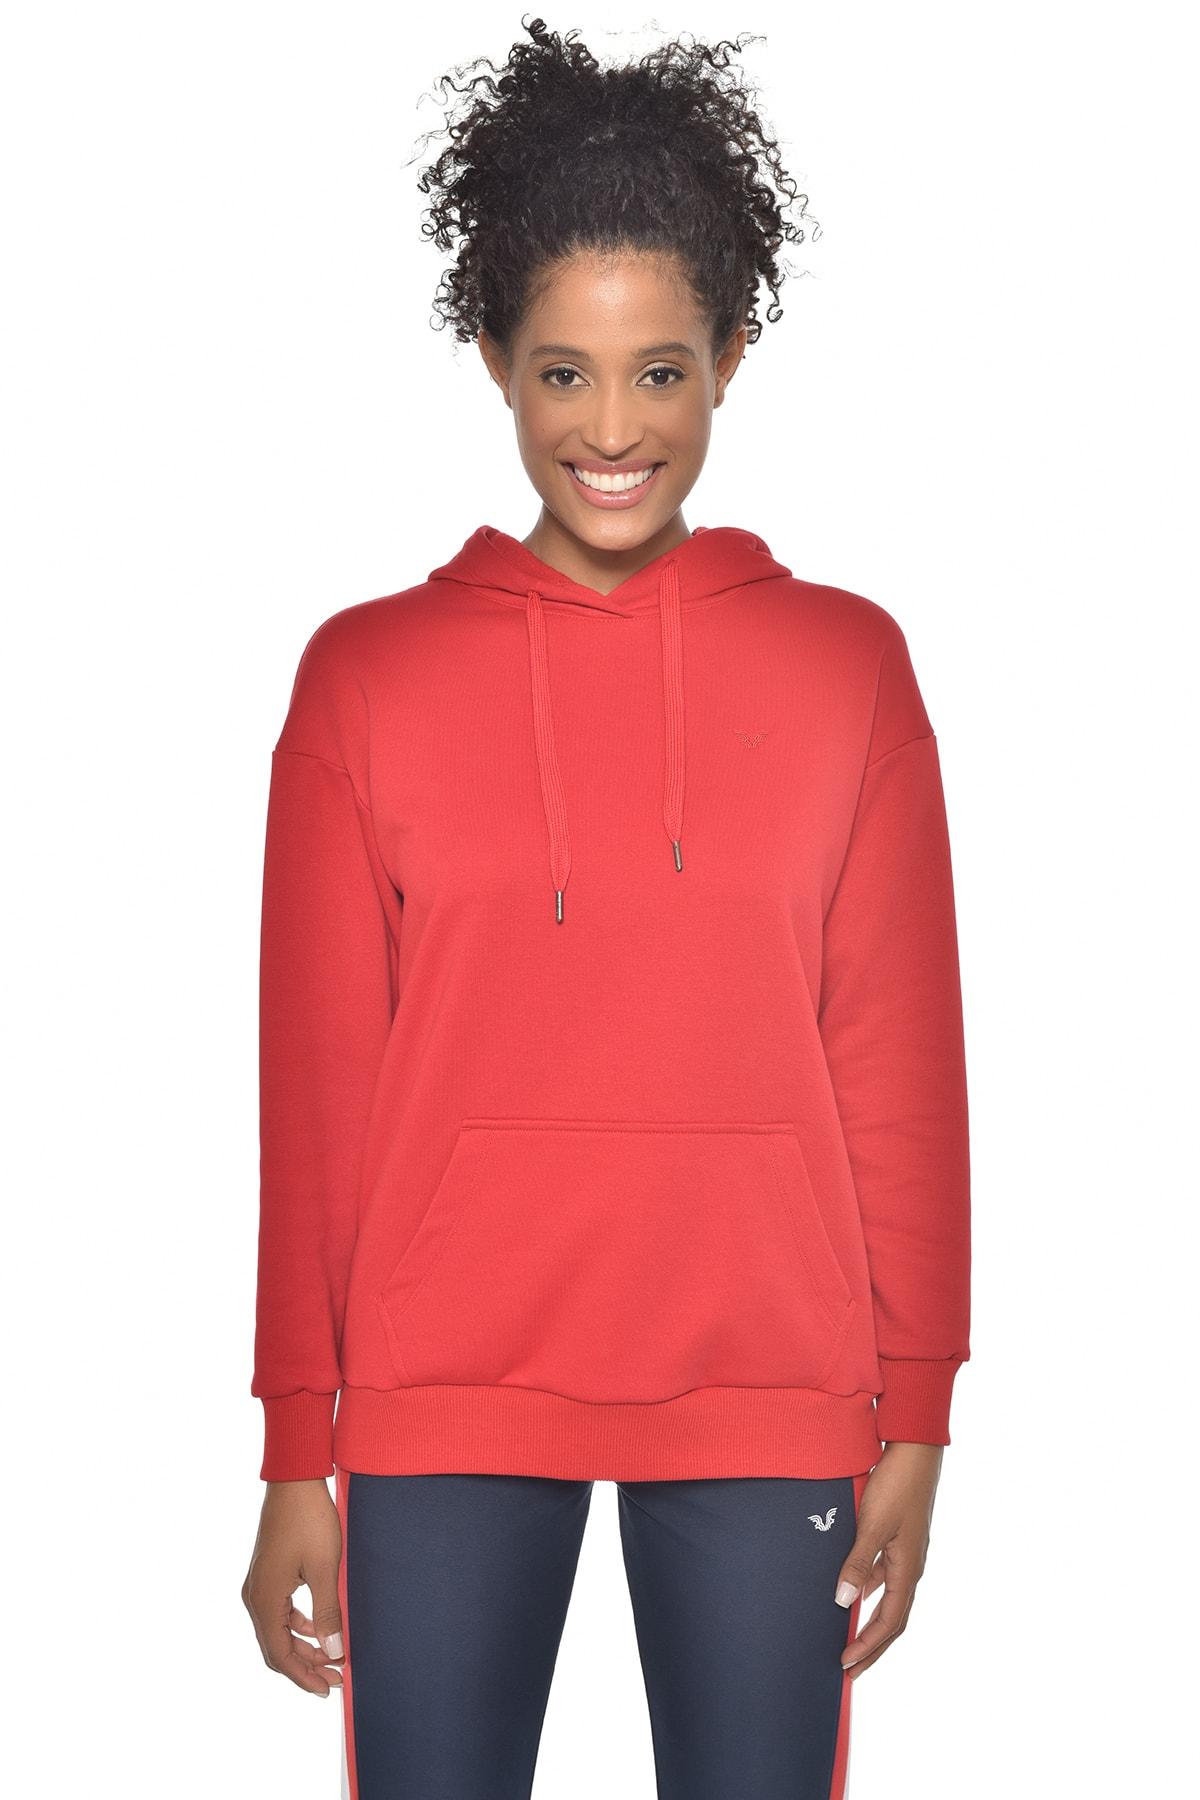 bilcee Kırmızı Kadın Kapüşonlu Sweatshırt GW-8785 1